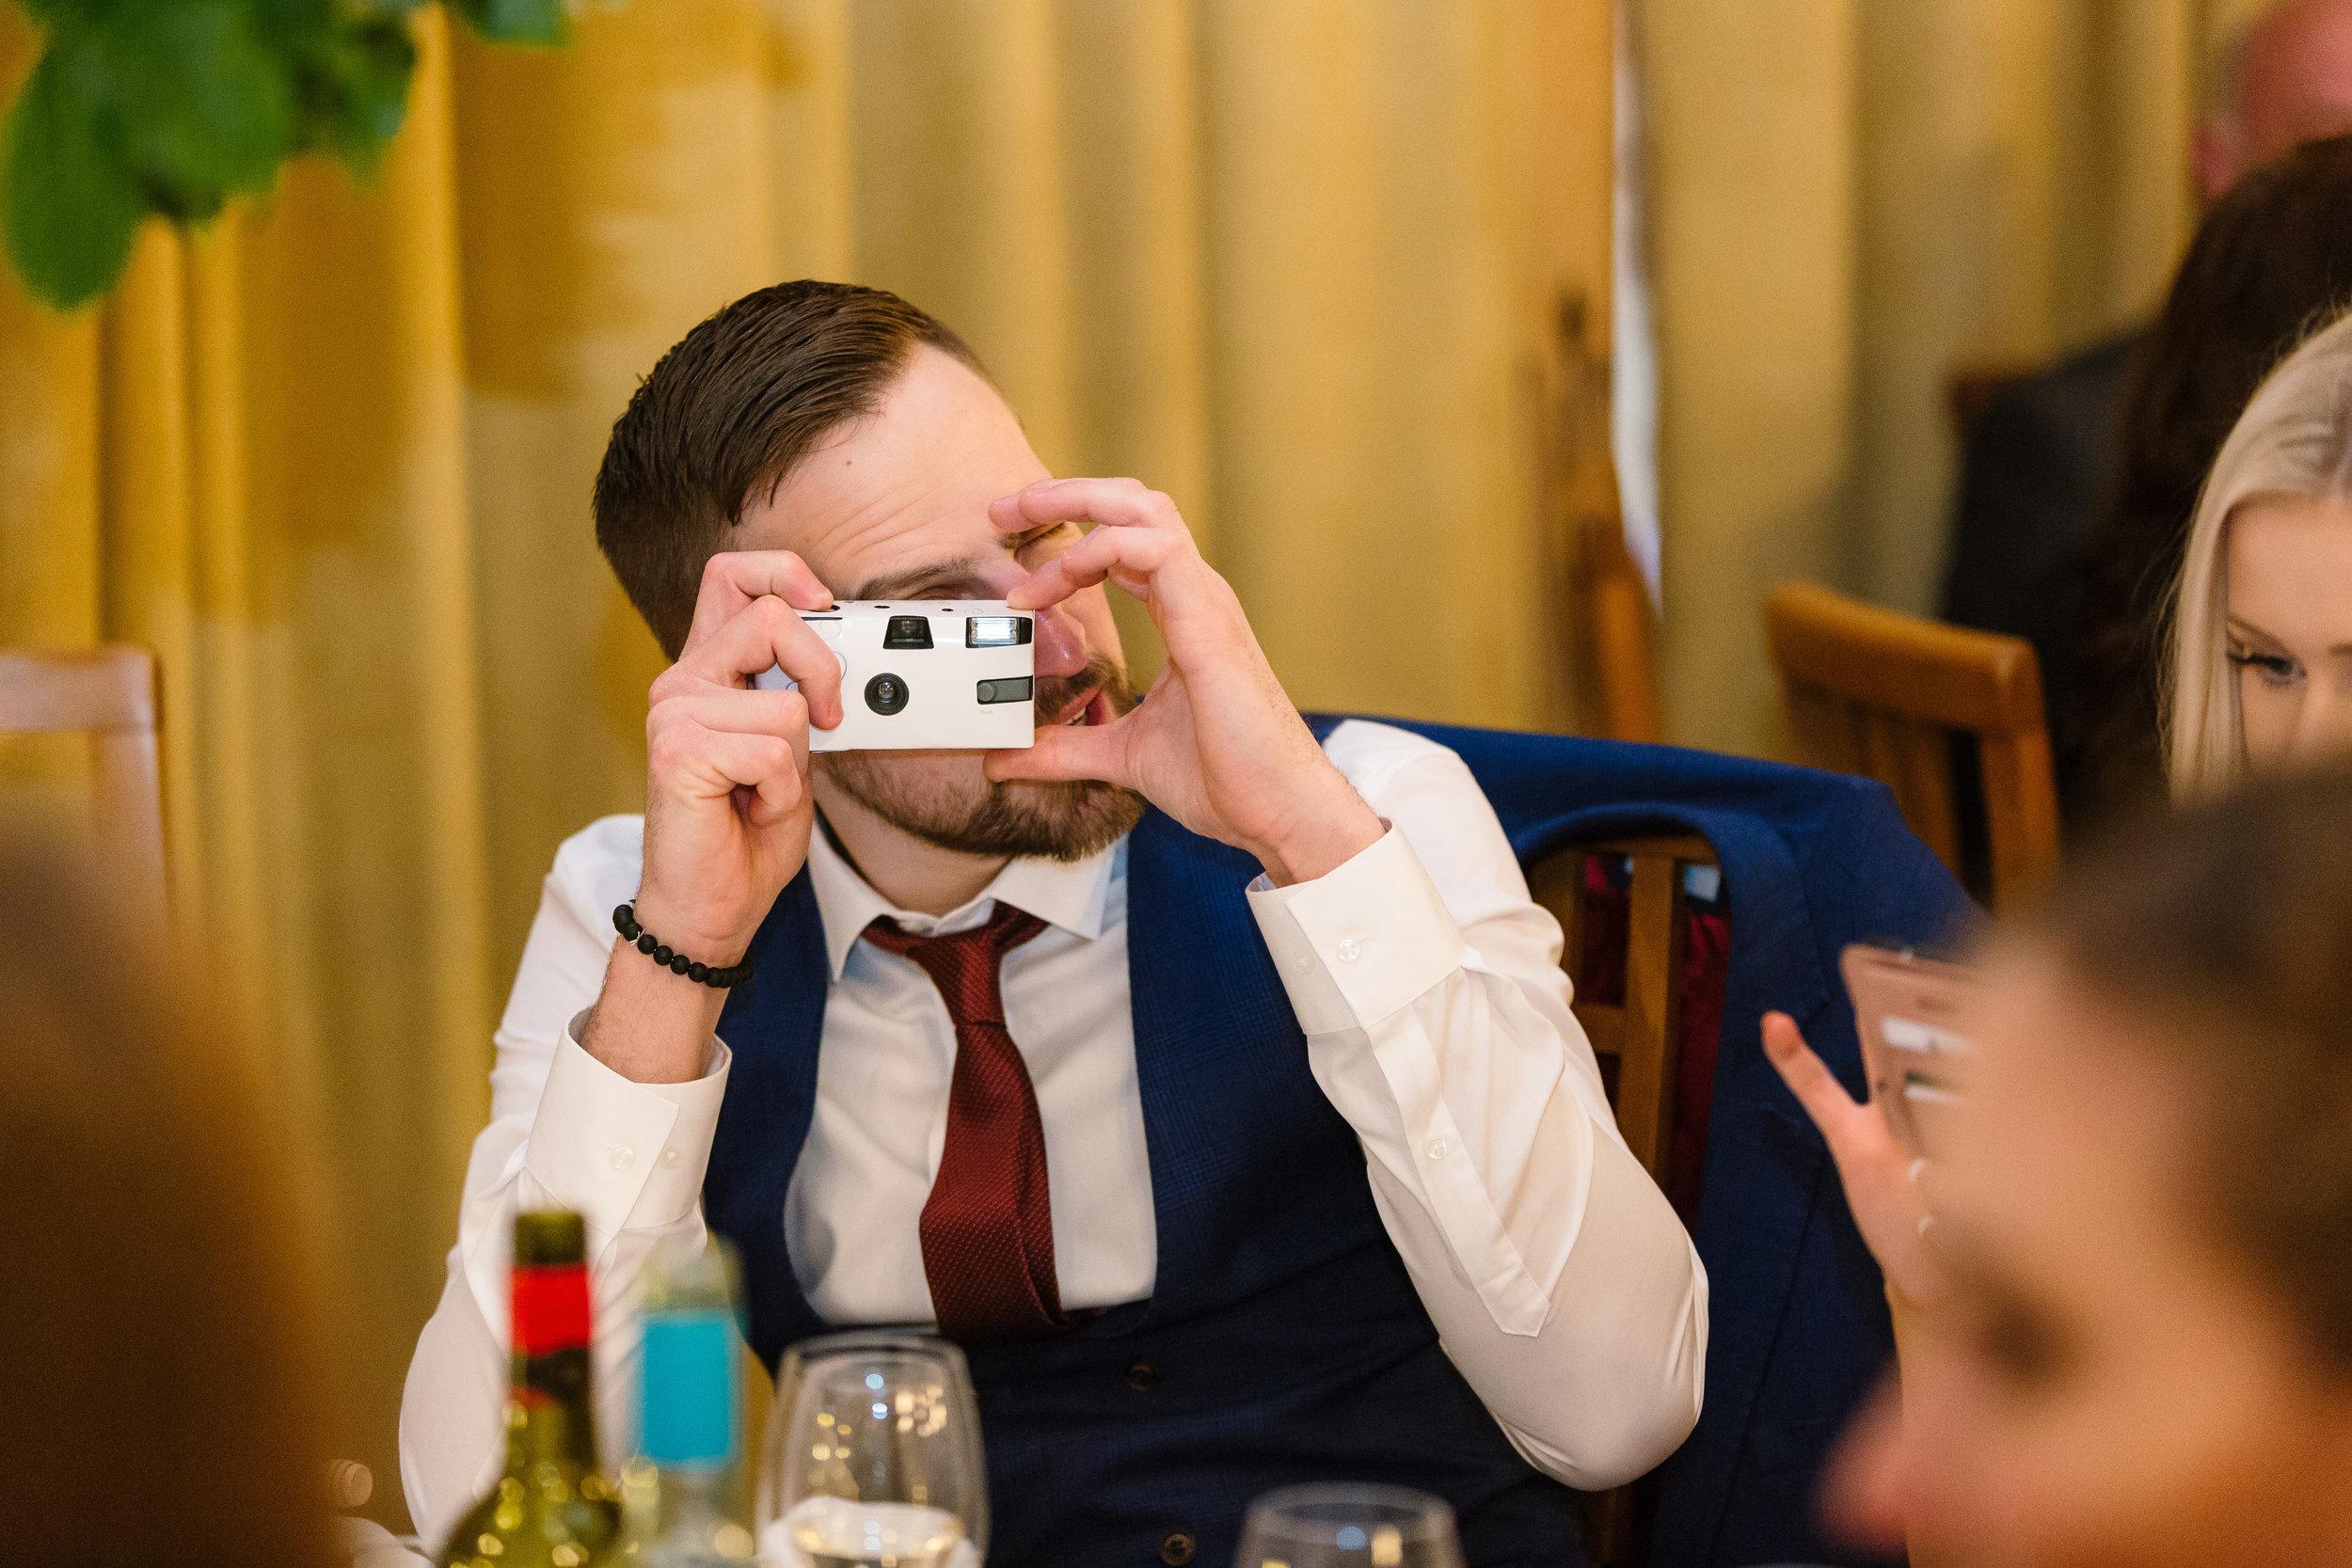 Sarah-Fishlock-Photography-Hampshire-wedding-photographer-hampshire / fleet-wedding-photographer-fleet / rivervale-barn-wedding-photographer / hampshire-barn-wedding-venue / hampshire-wedding-venue / barn-wedding-hampshire / rivervale-barn / wedding-in-snow